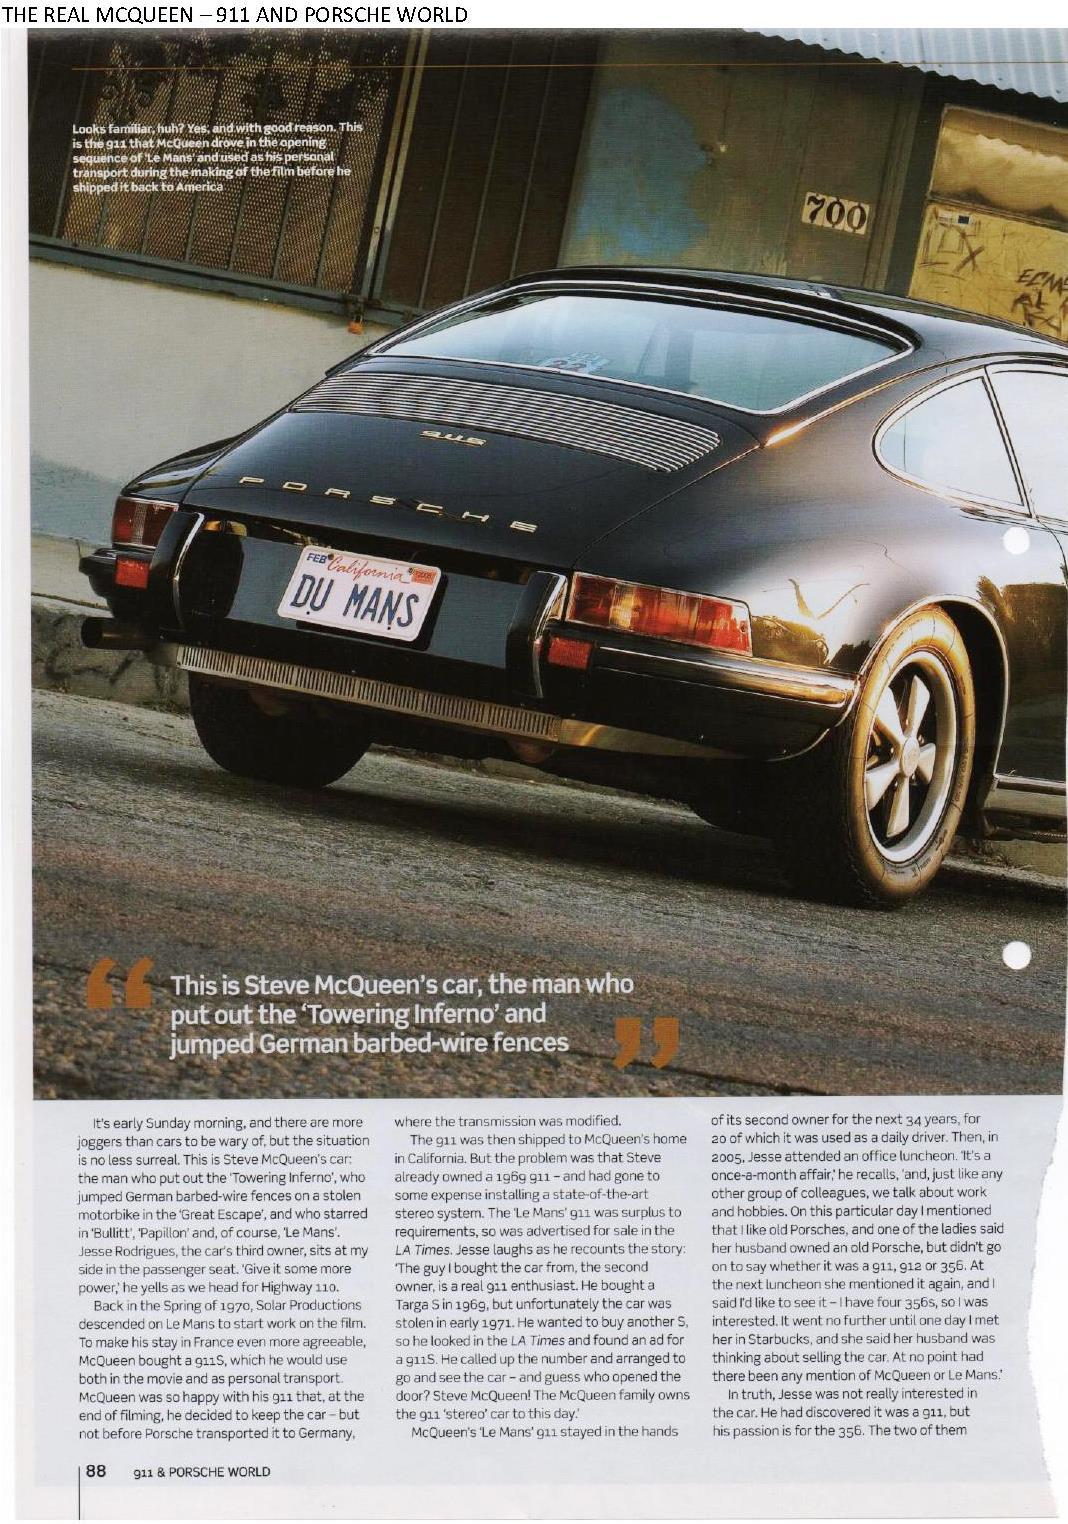 steve mcqueen s porsche 911s 1970 le mans movie car 911 porsche world mag porsche cars. Black Bedroom Furniture Sets. Home Design Ideas